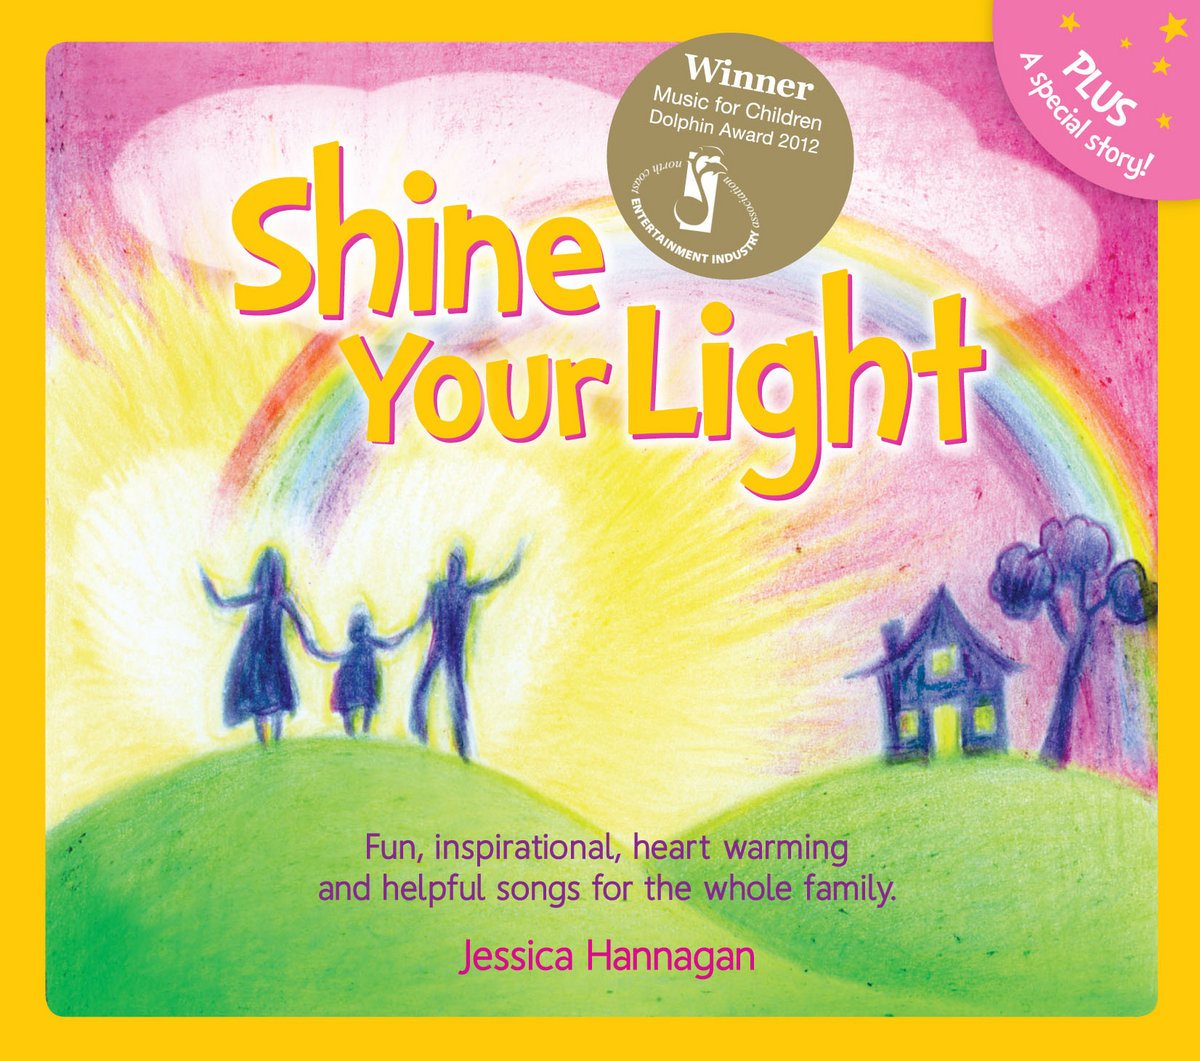 Shine your light jessica hannagan shine your light award winning childrens cd 12 beautiful songs and a story hexwebz Gallery